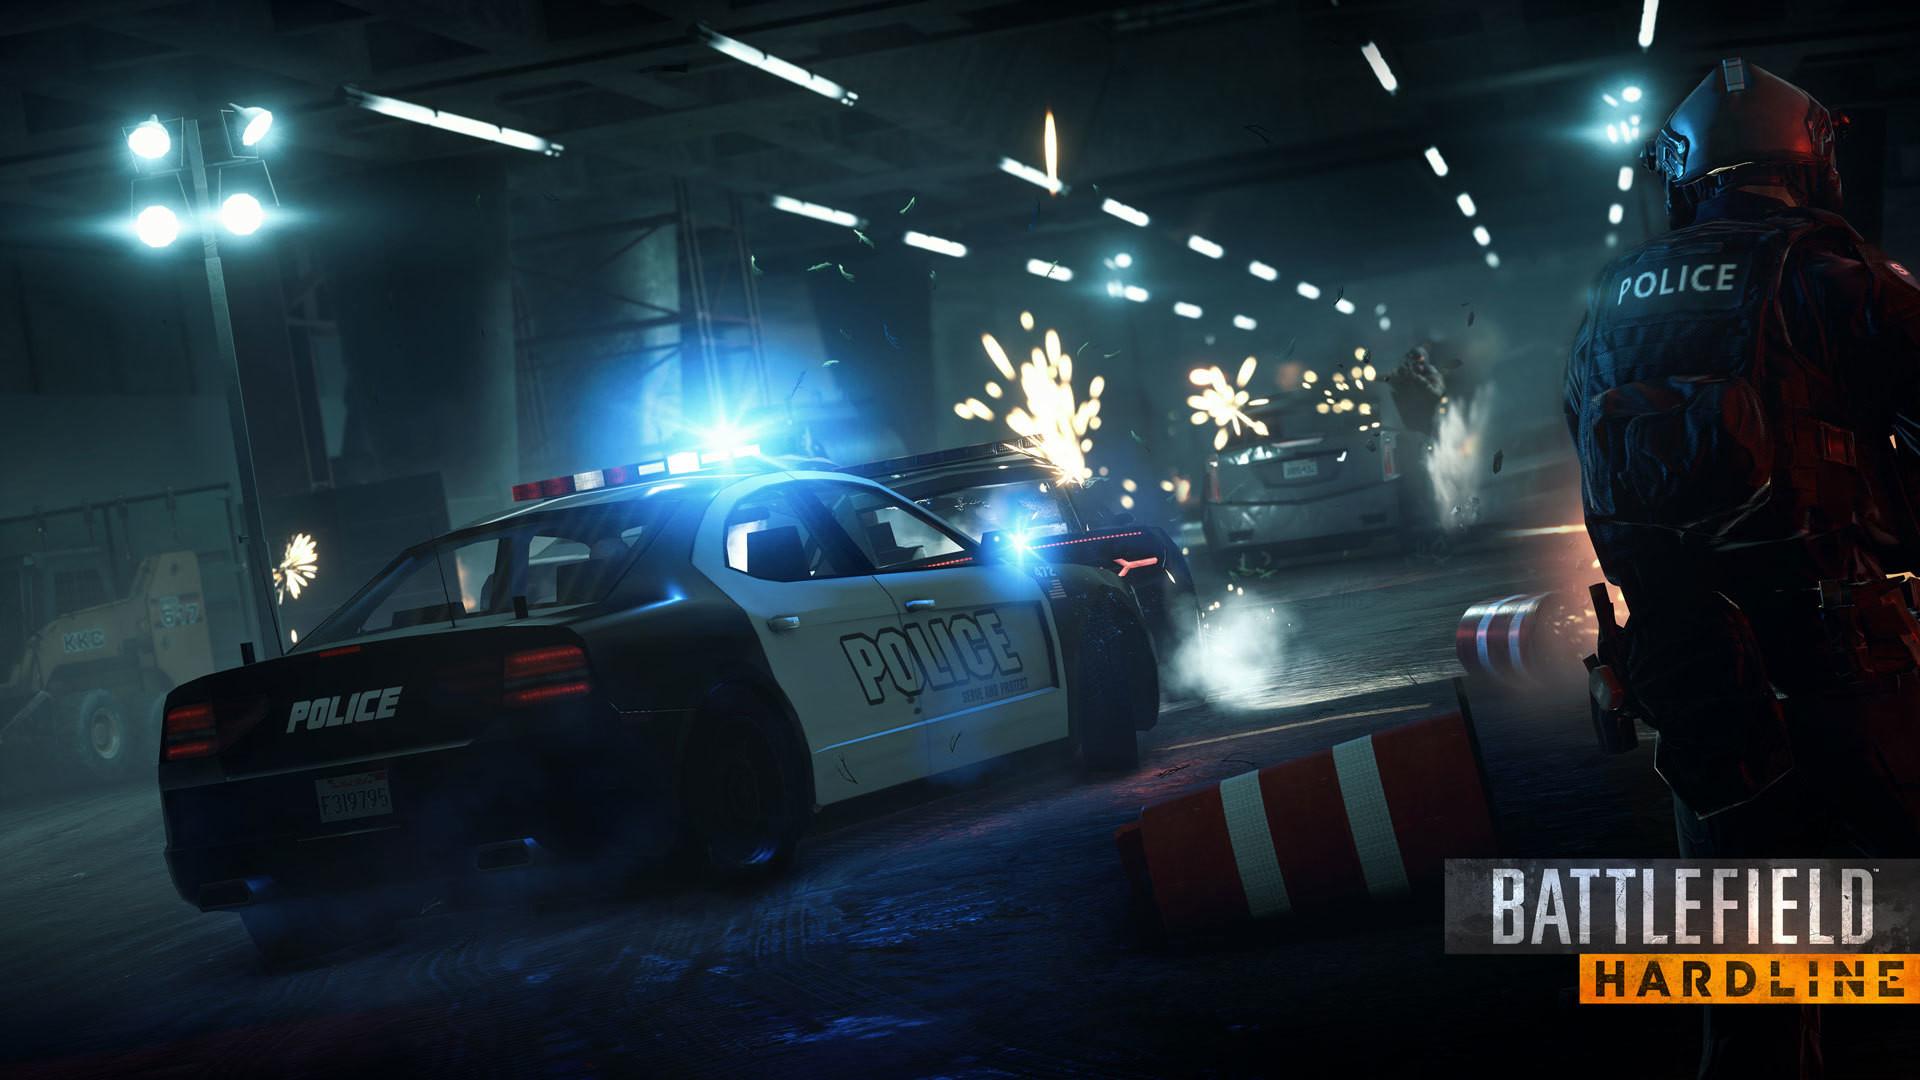 Battlefield Hardline – Police Car wallpaper